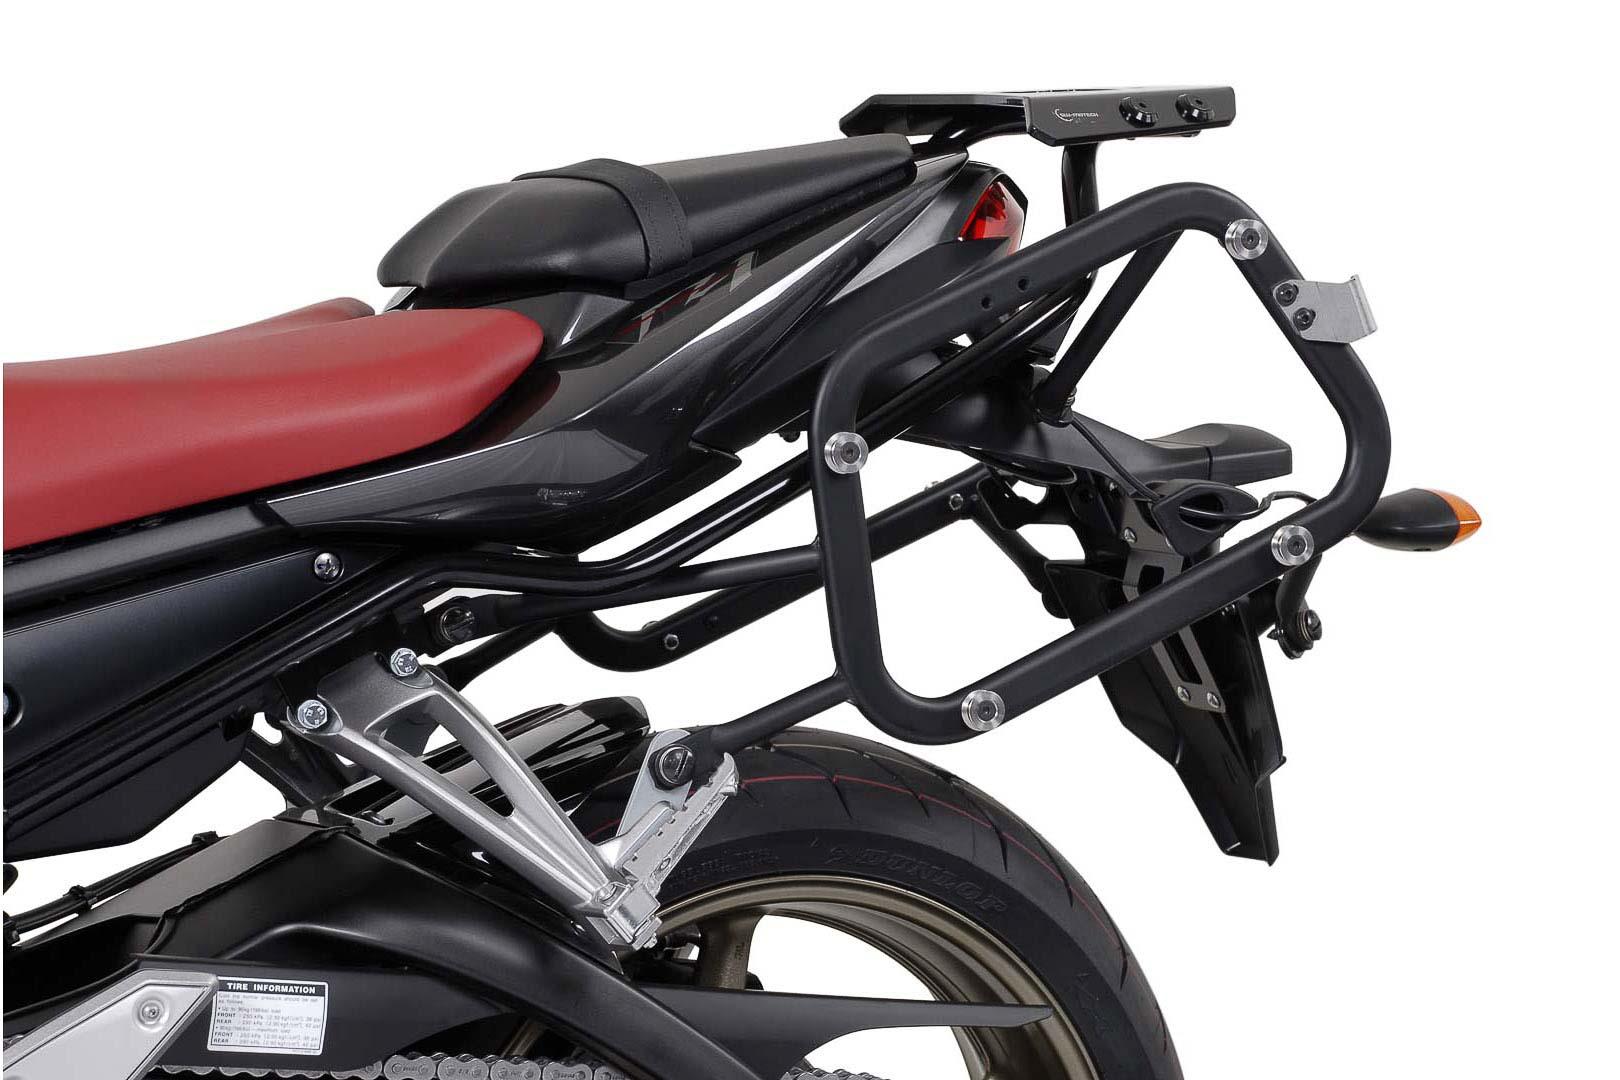 SW-Motech Quick-Lock Evo sivutelinesarja Yamaha FZ1/FZ1 Fazer